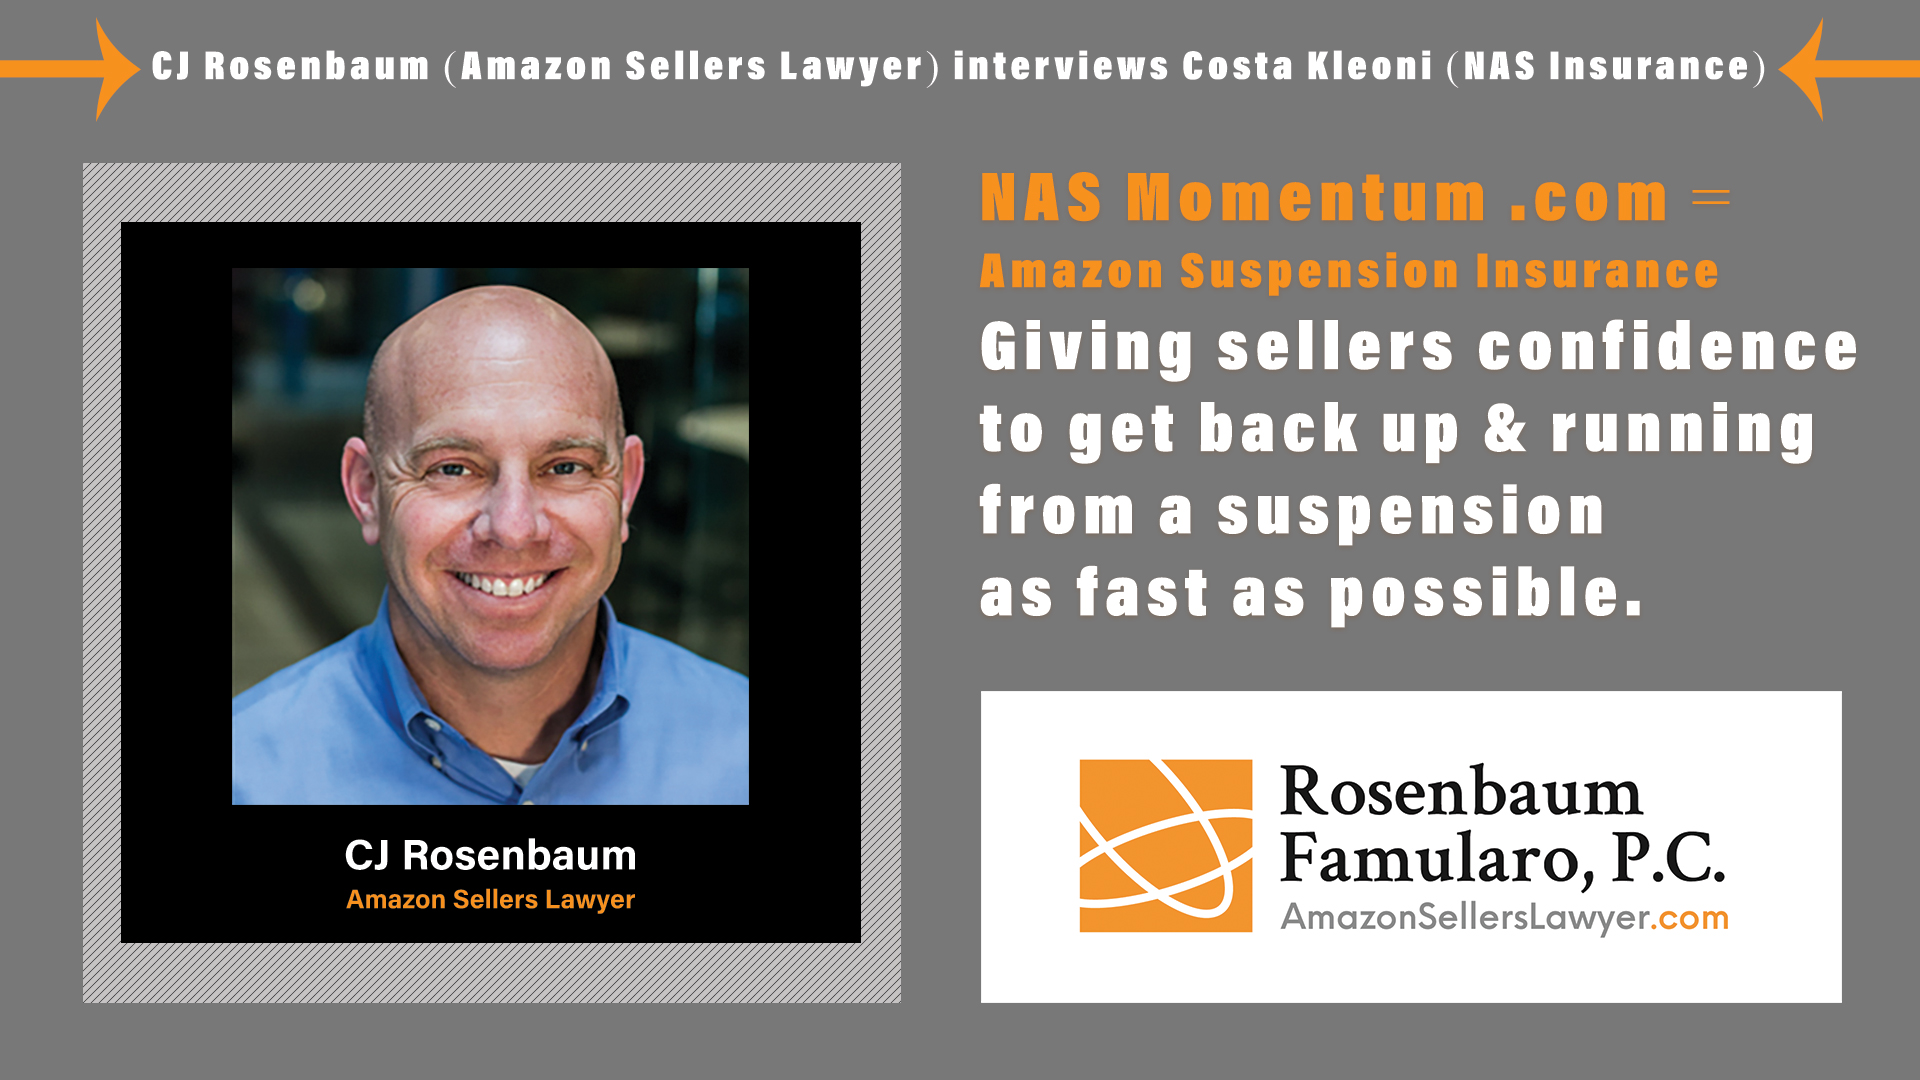 CJ Rosenbaum of Amazon Sellers Lawyer interviews Costa Kleoni of NAS Insurance